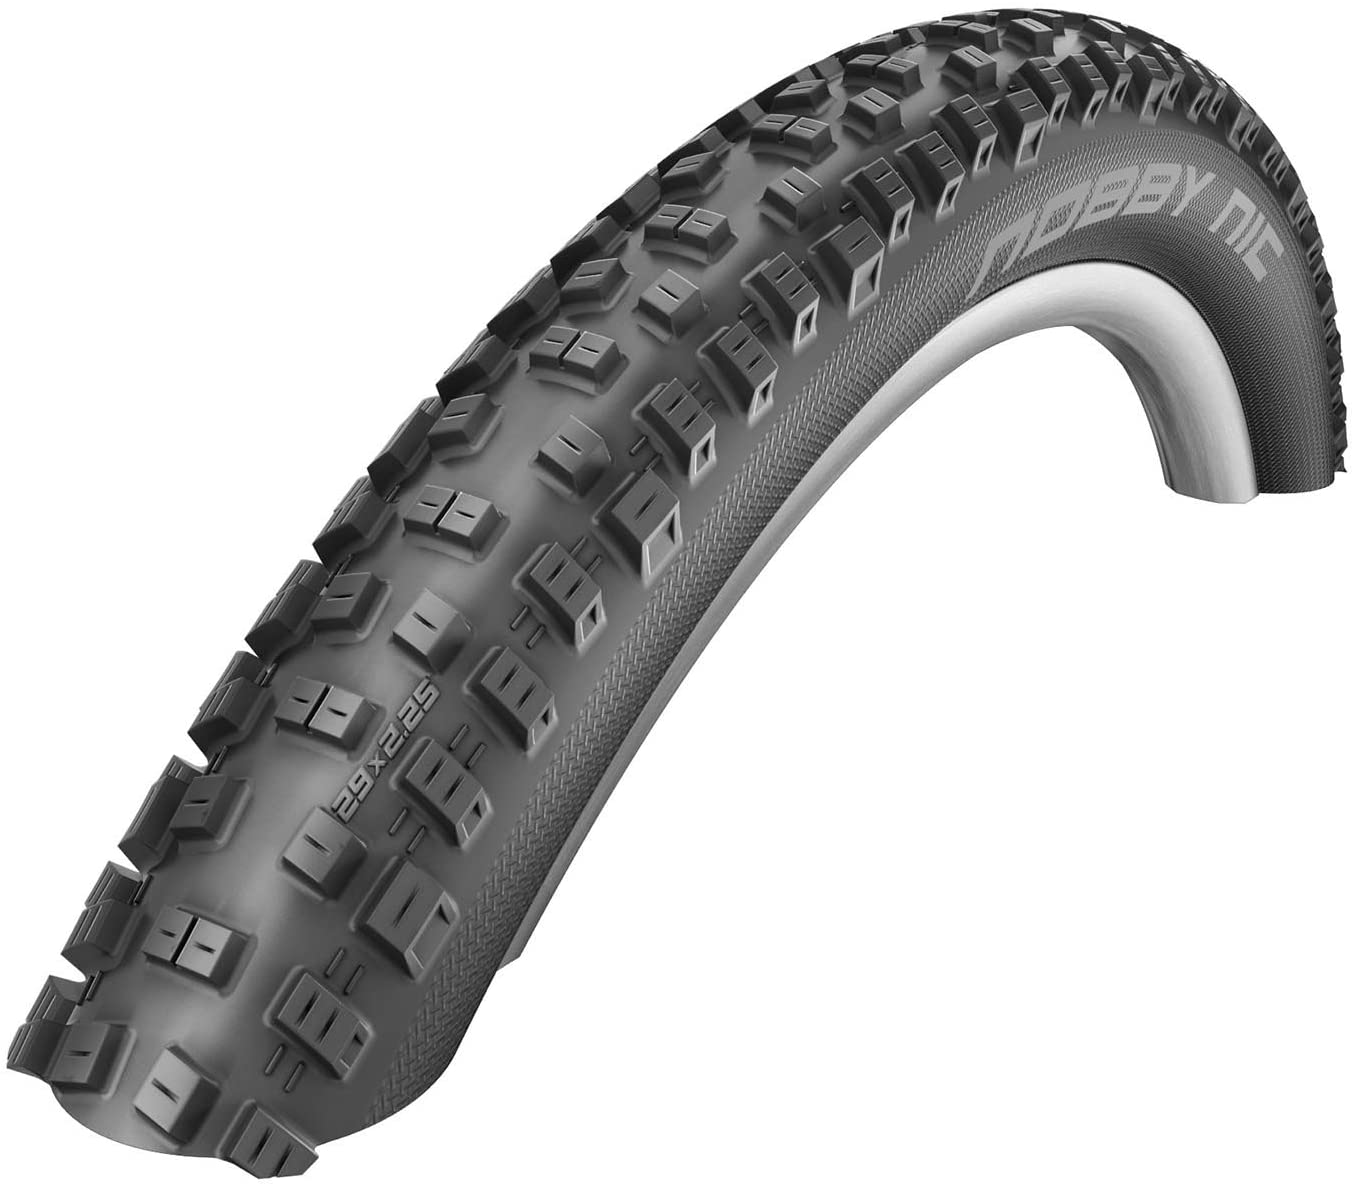 Schwalbe Nobby Nic Snakeskin Tubeless Easy Tire - 26in EVO, PaceStar, 26x2.25